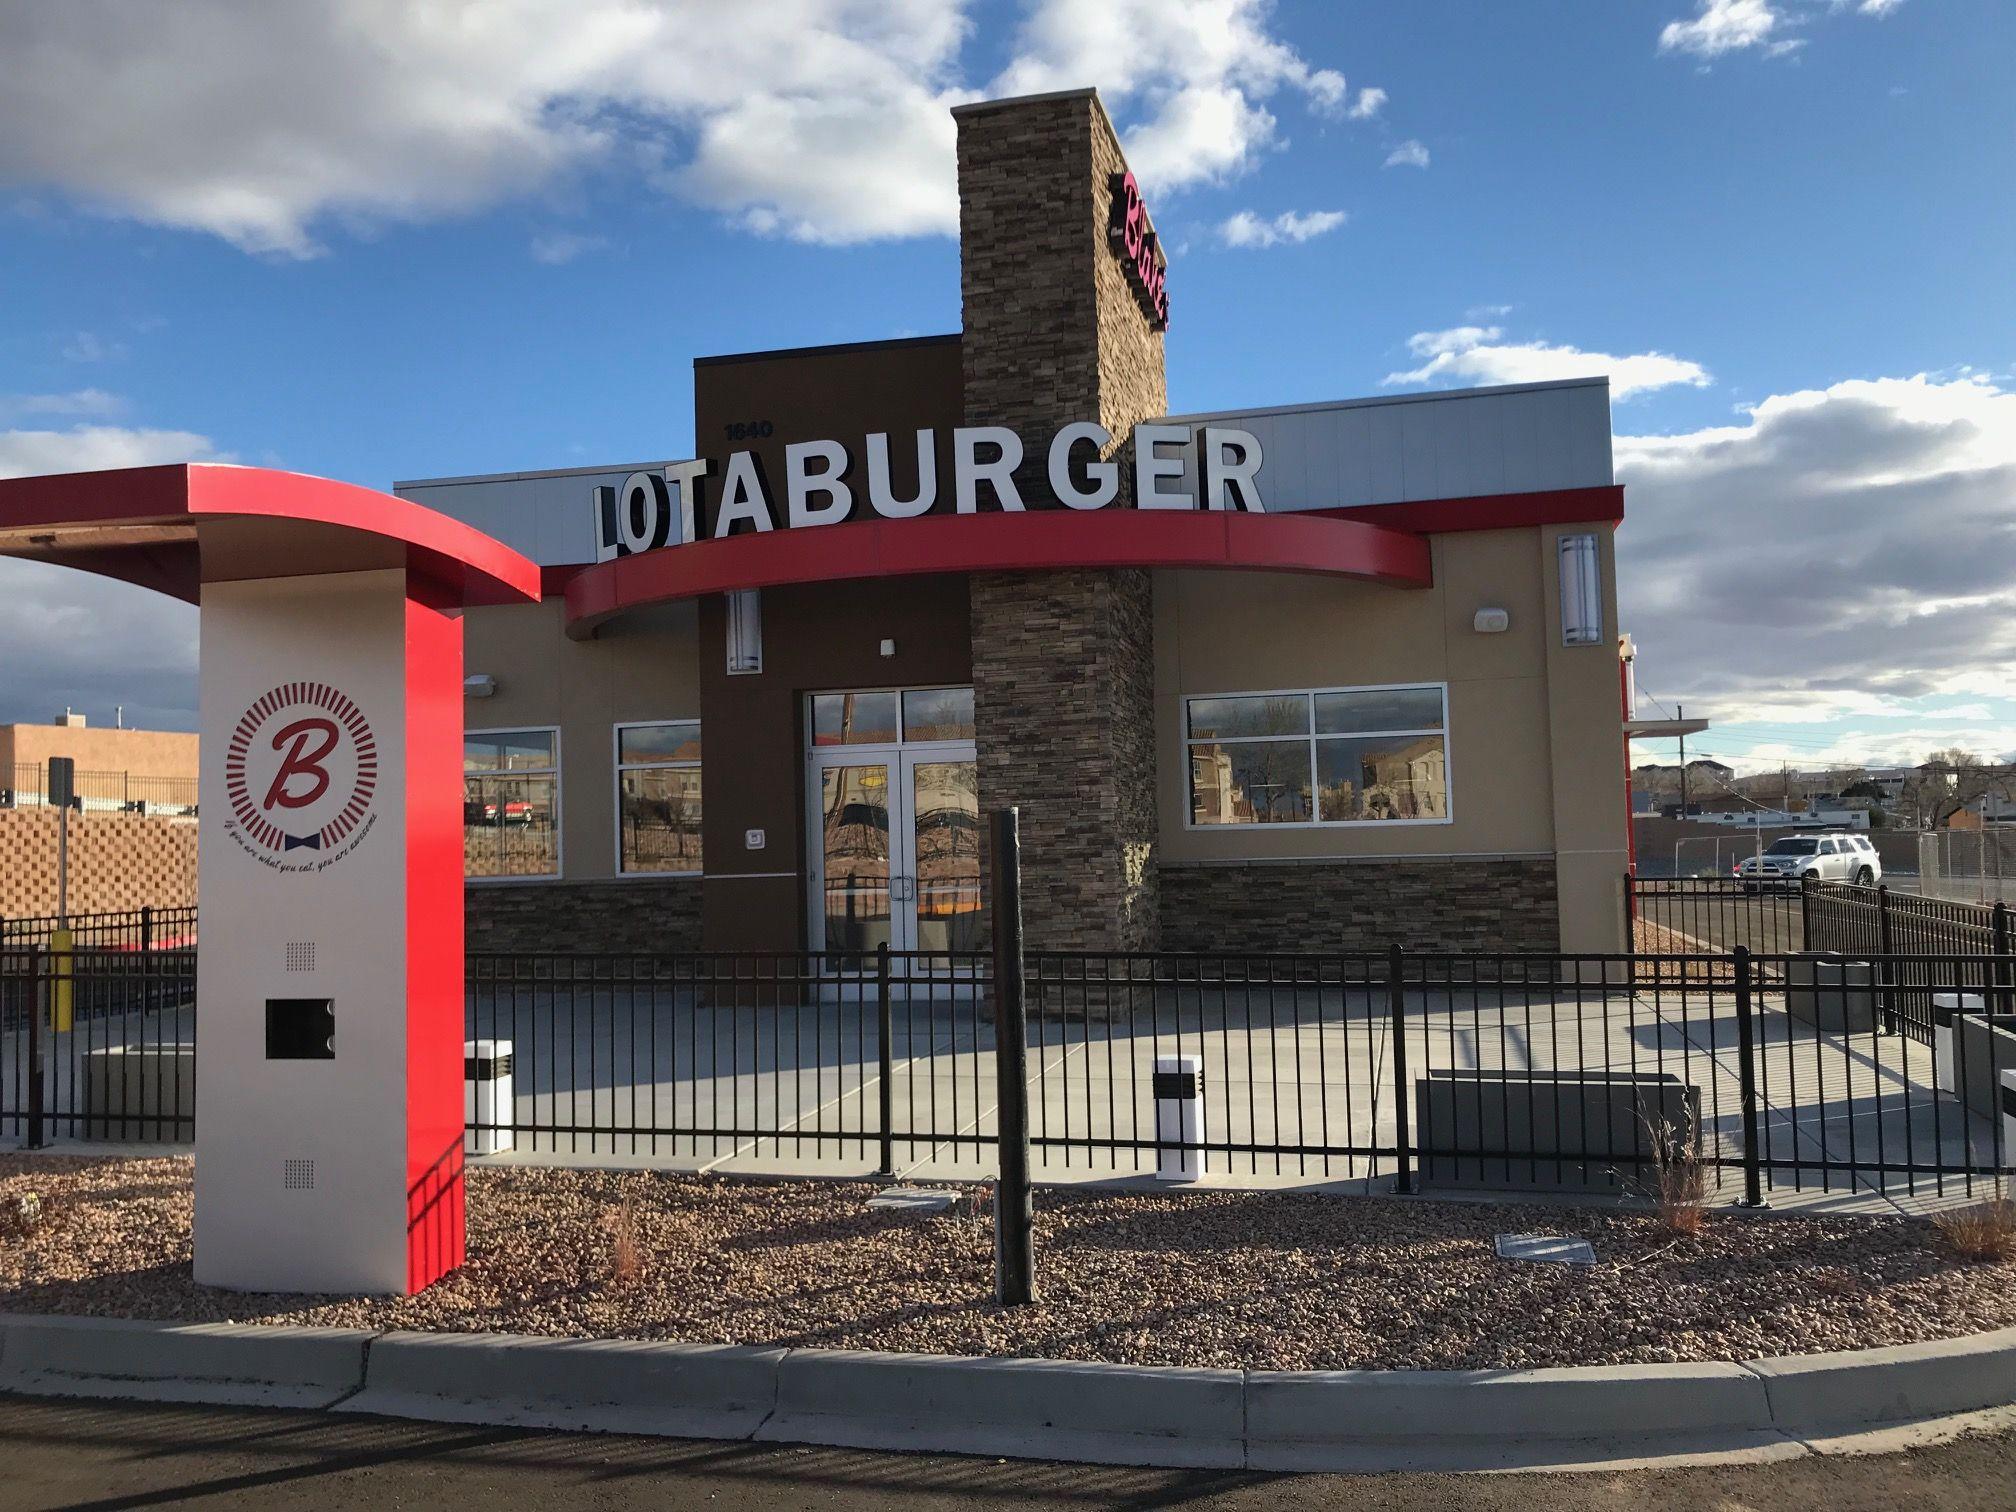 Blake S Lotaburger Opens 75th Location On Valentine S Day I Am New Mexico New Mexico Mexico Locations